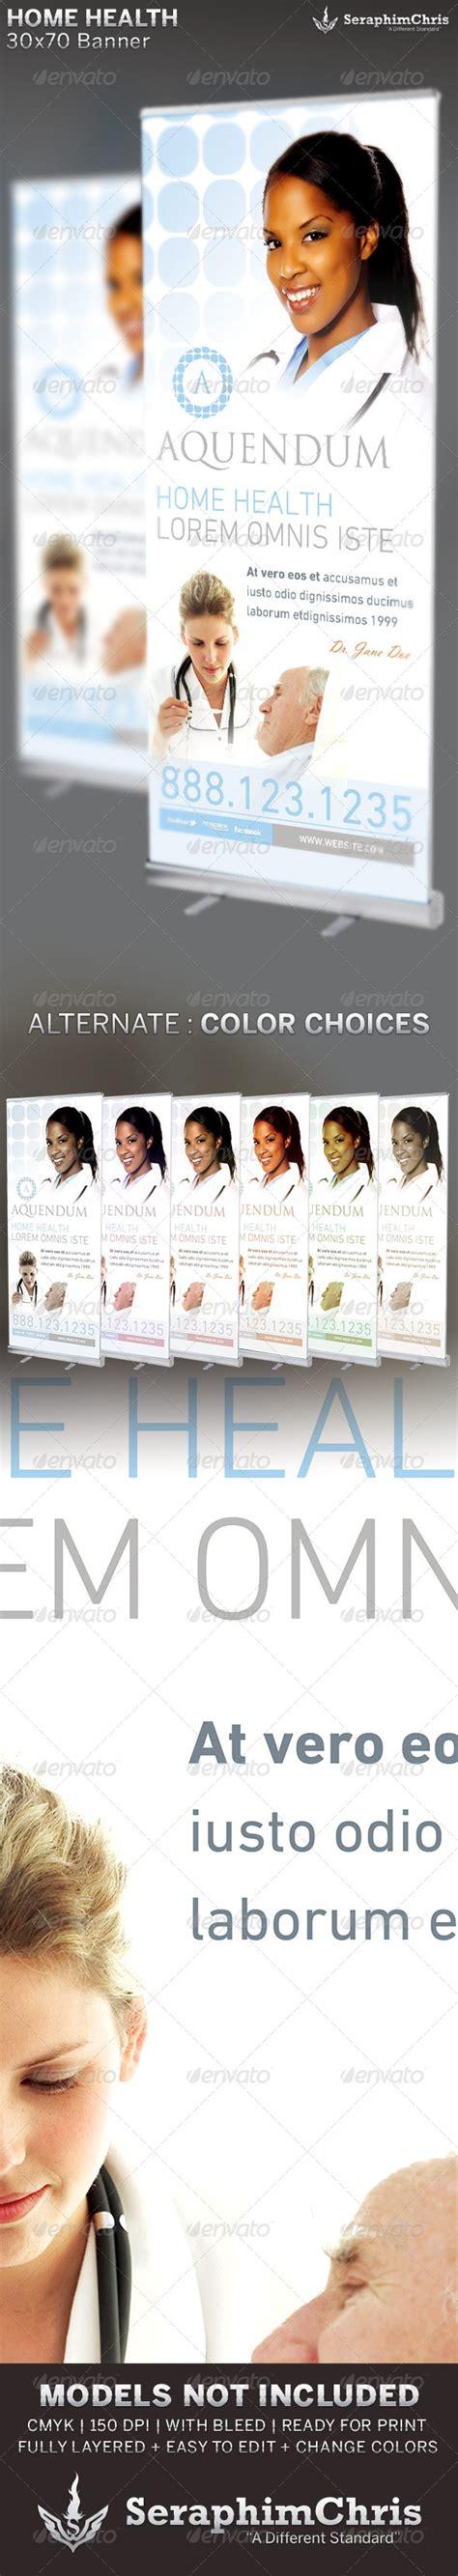 flyers for home health agency 187 tinkytyler org stock